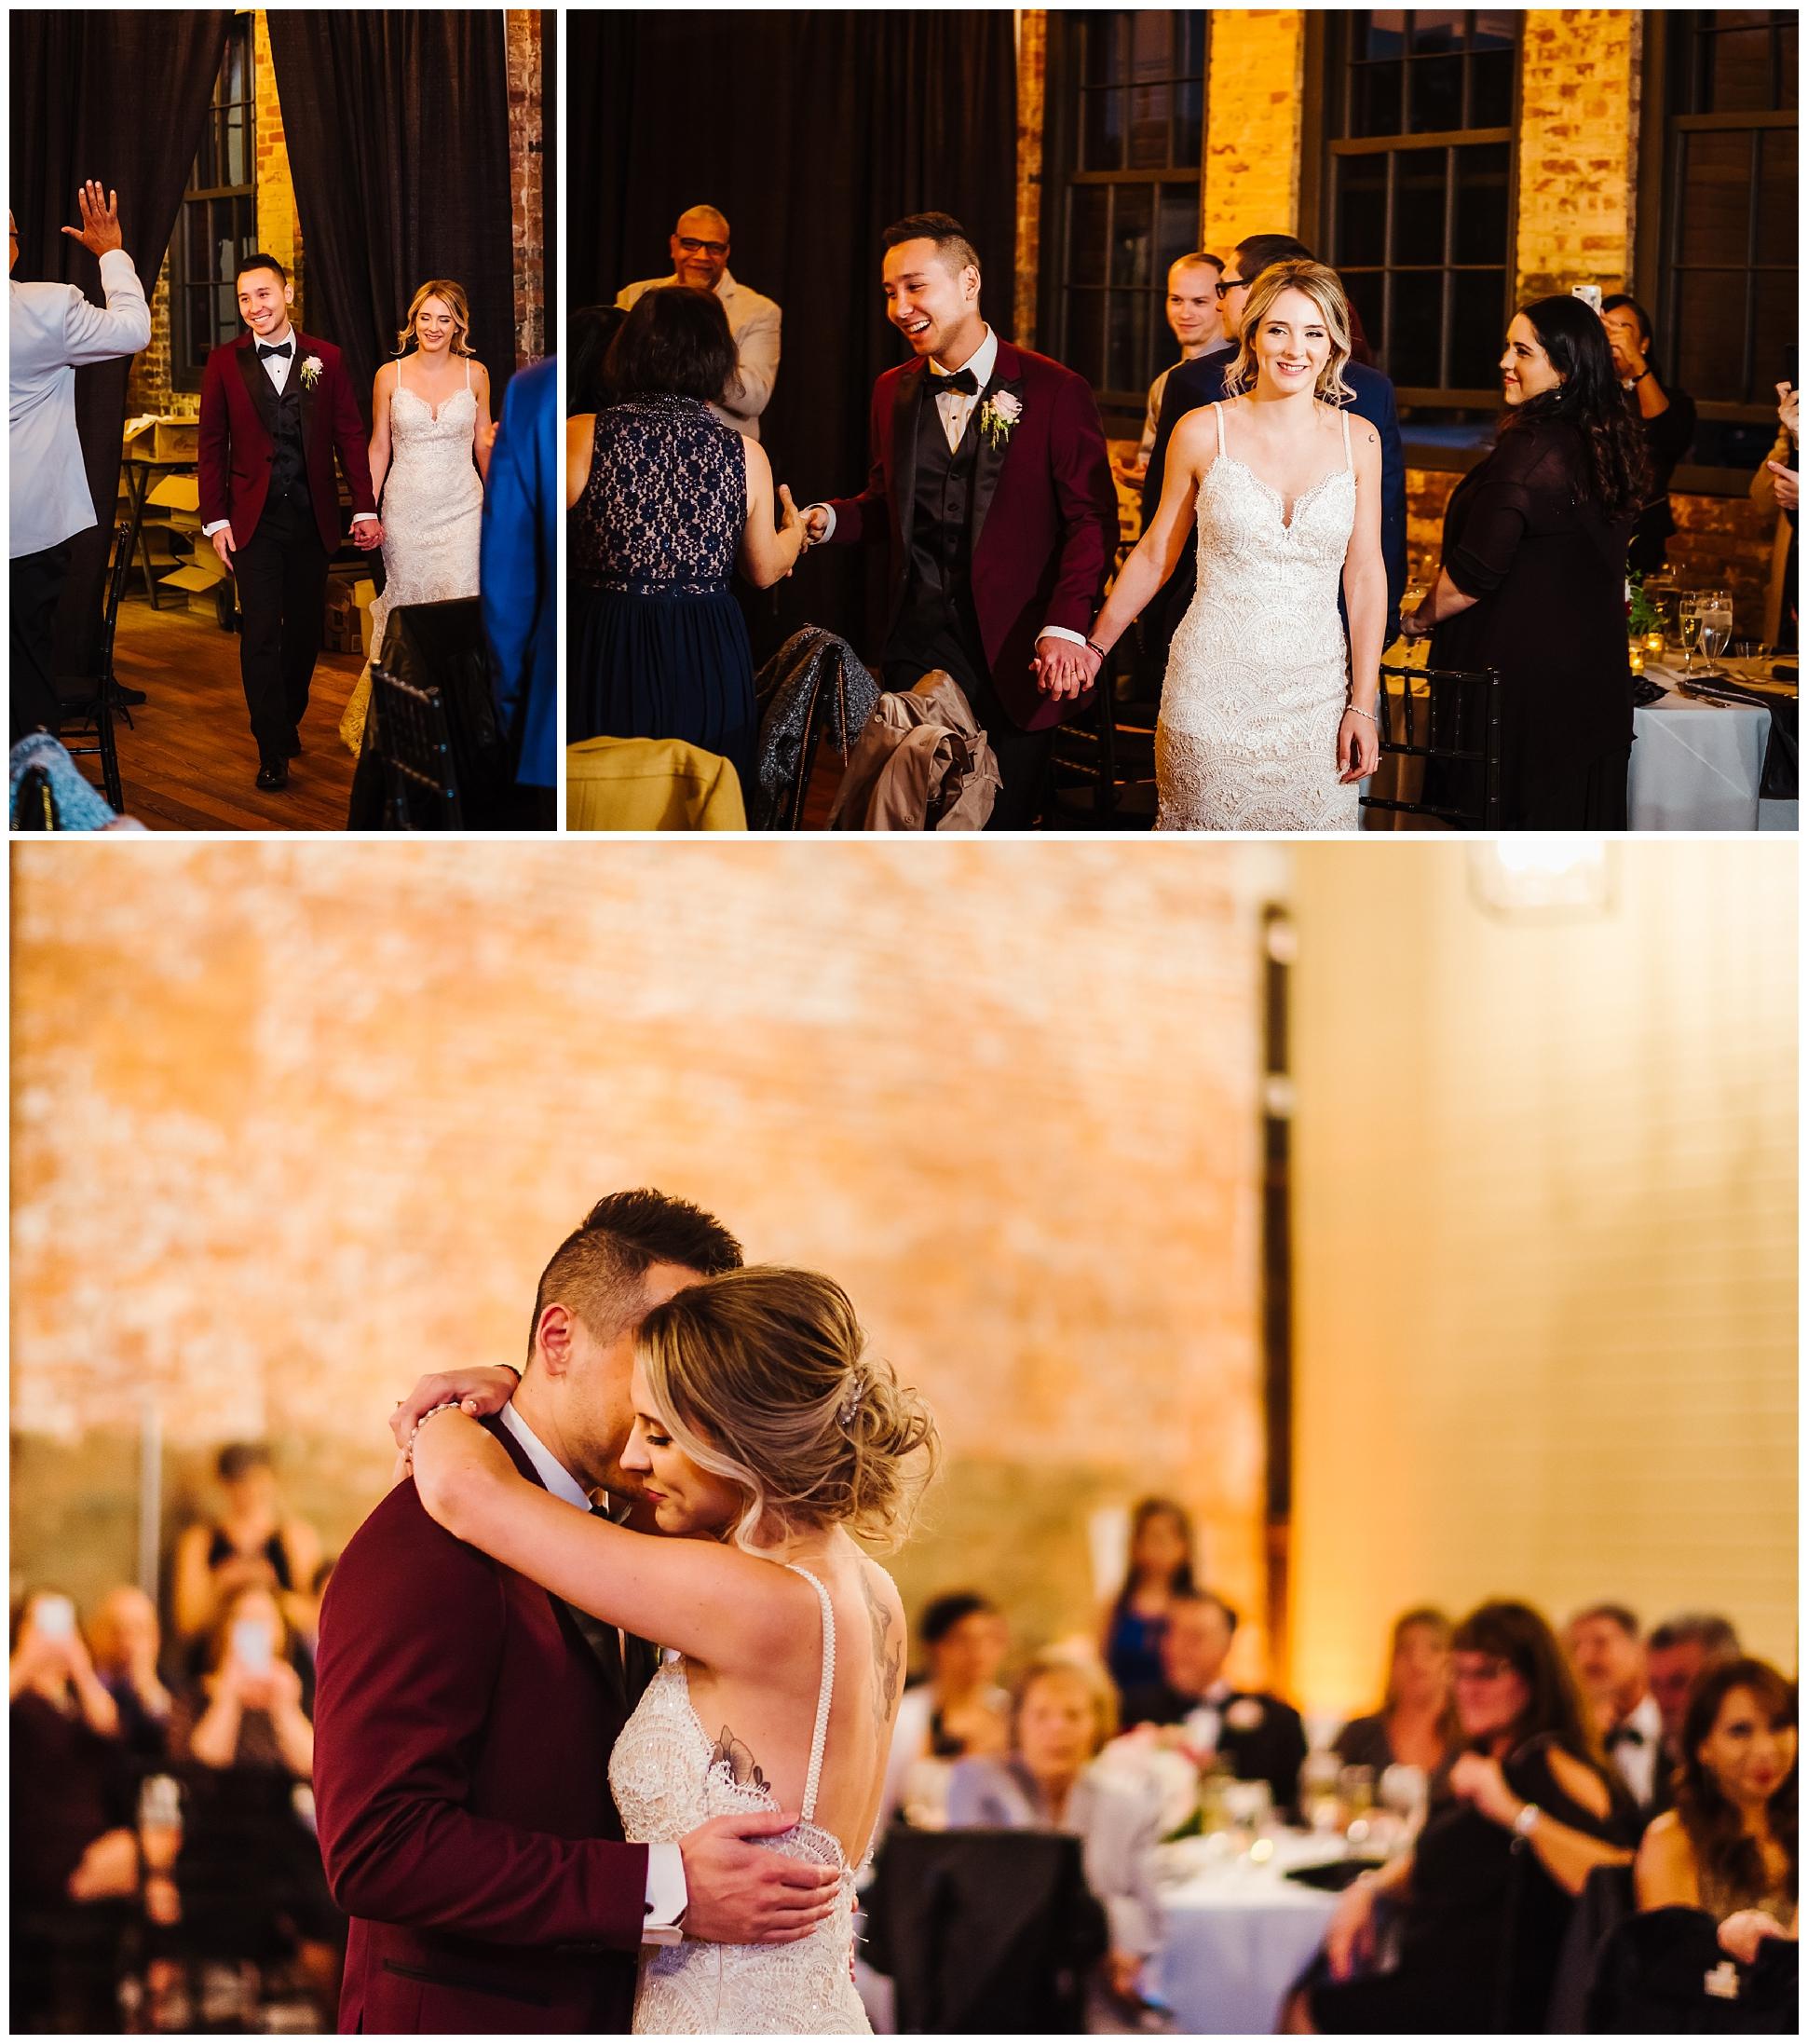 tampa-armeture-wedding-photographer-edgy-industrial-downtown-fancy-free-nursery-tattoo-burgandy-velvet_0068.jpg